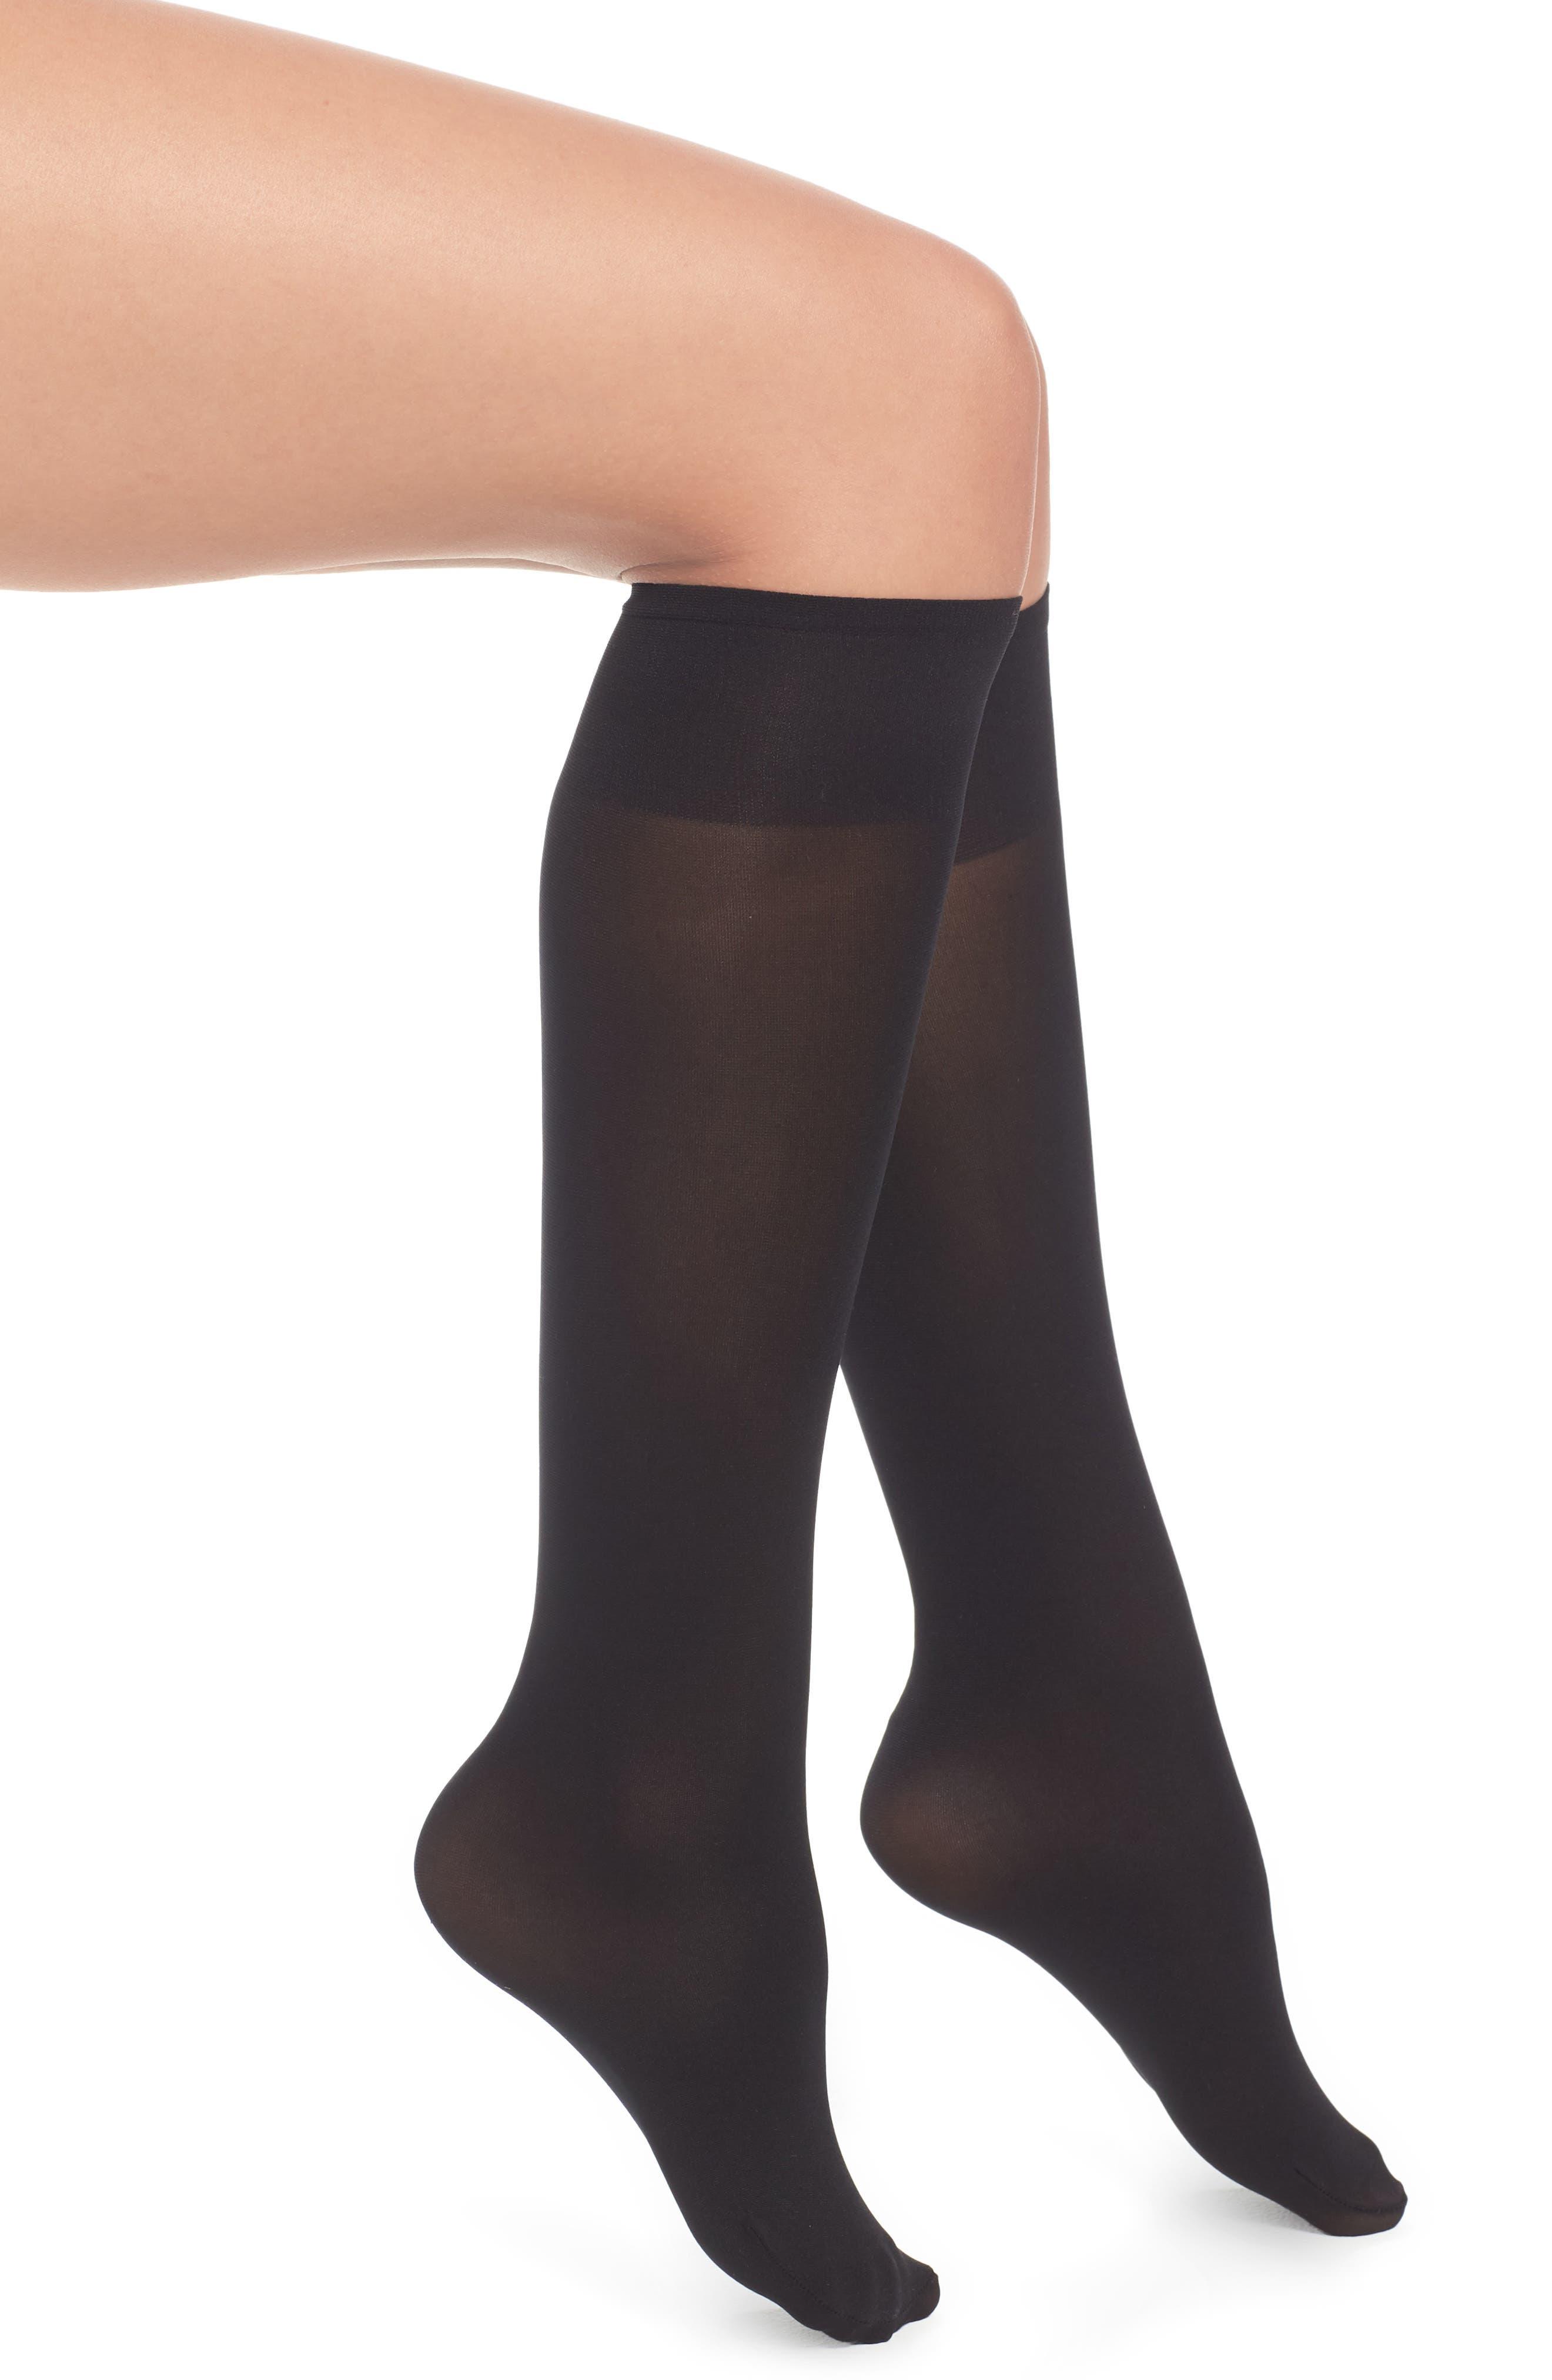 Ingrid Opaque Knee Highs,                             Main thumbnail 1, color,                             Black